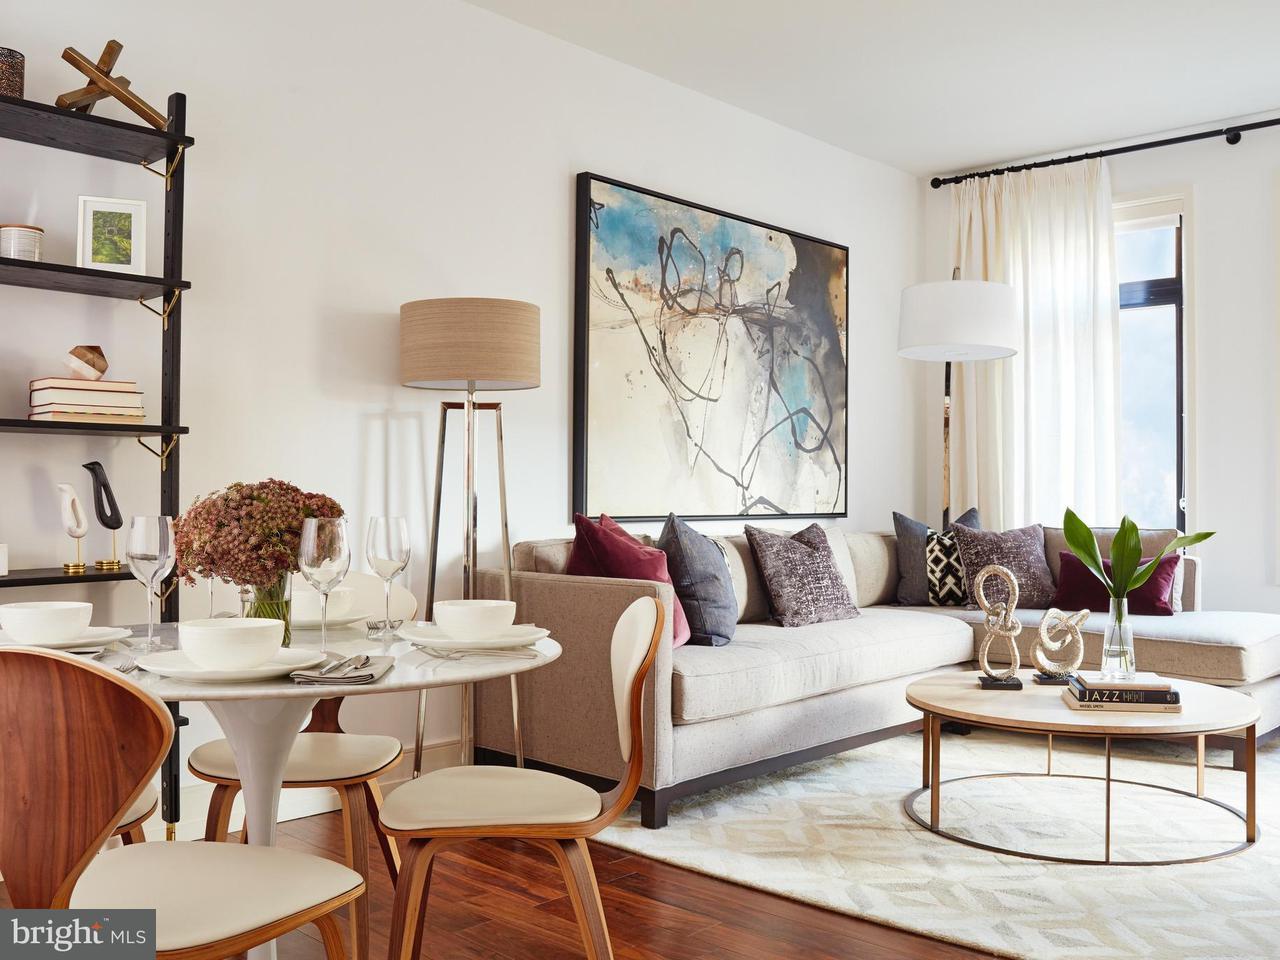 Condominium for Rent at 1310 U St NW #312 Washington, District Of Columbia 20009 United States